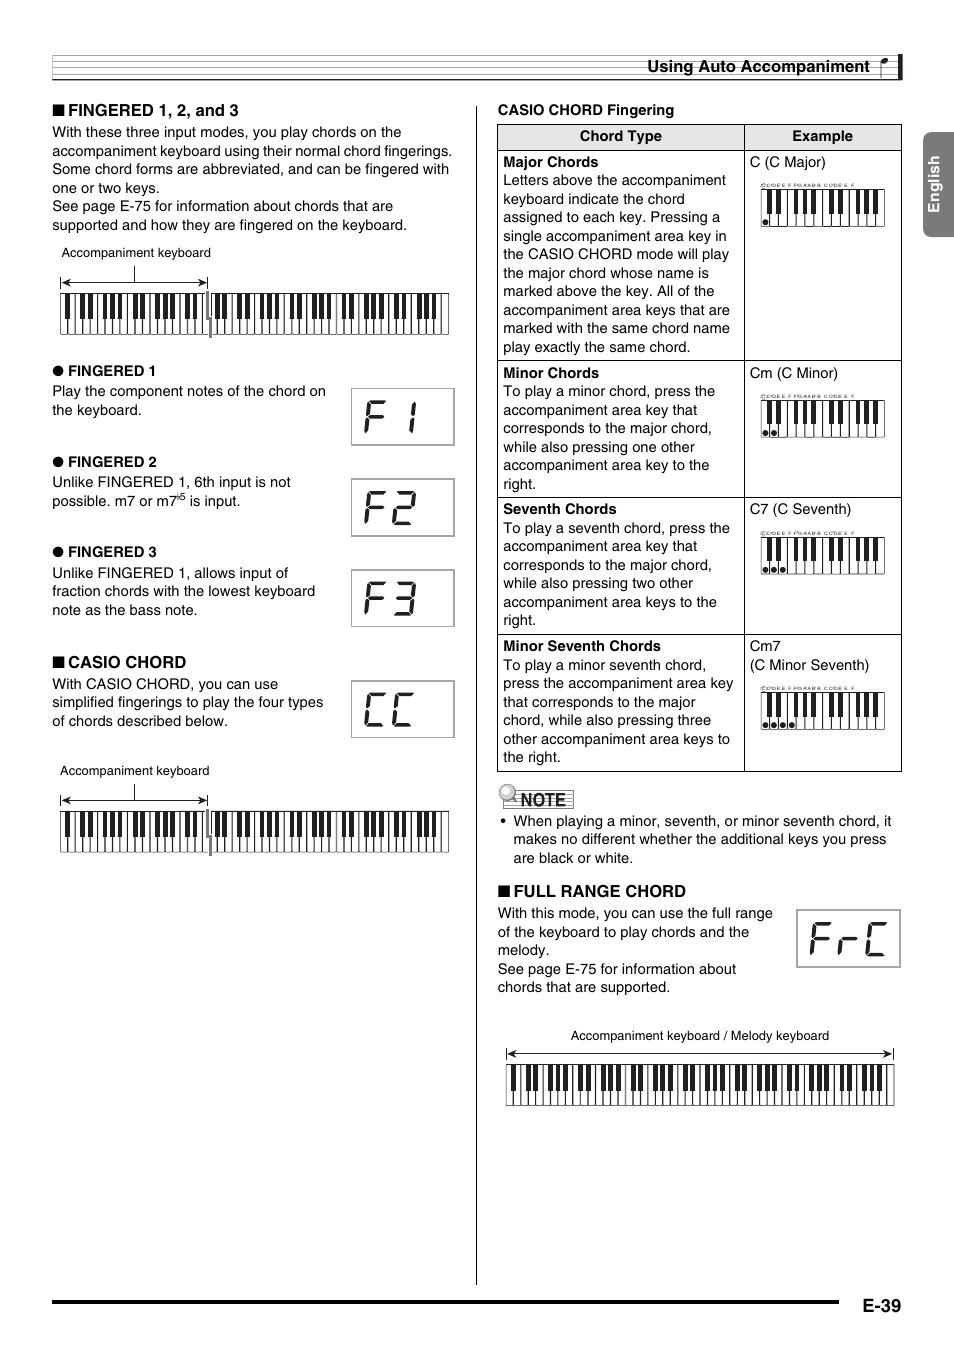 E-39, Using auto accompaniment, Fingered 1, 2, and 3